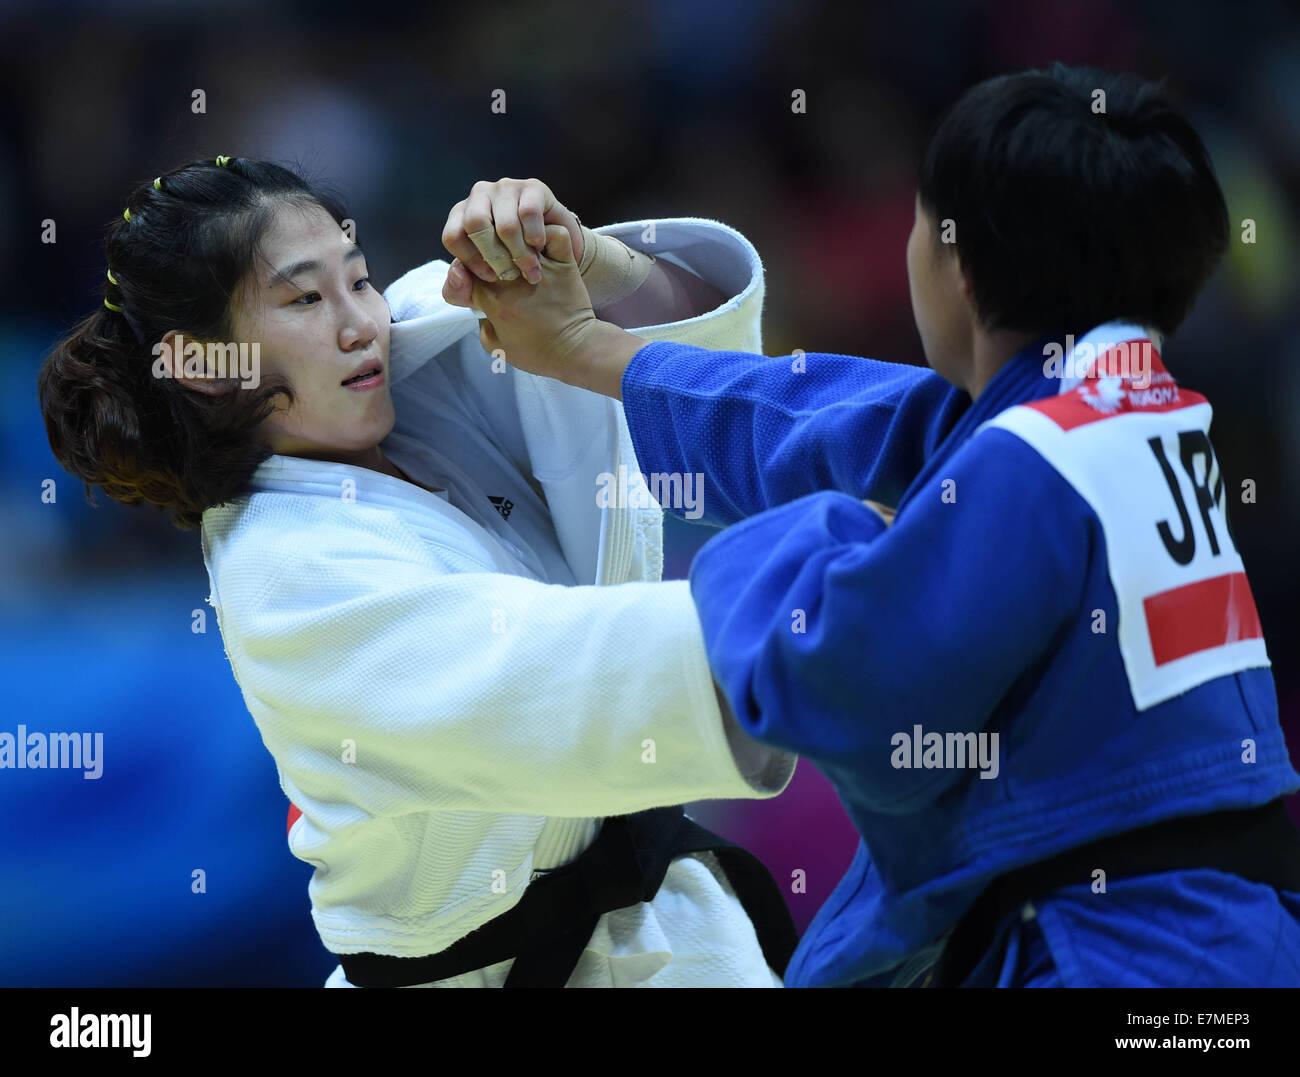 Imagenes De Jandi incheon, south korea. 21st sep, 2014. kim jandi (l) of south